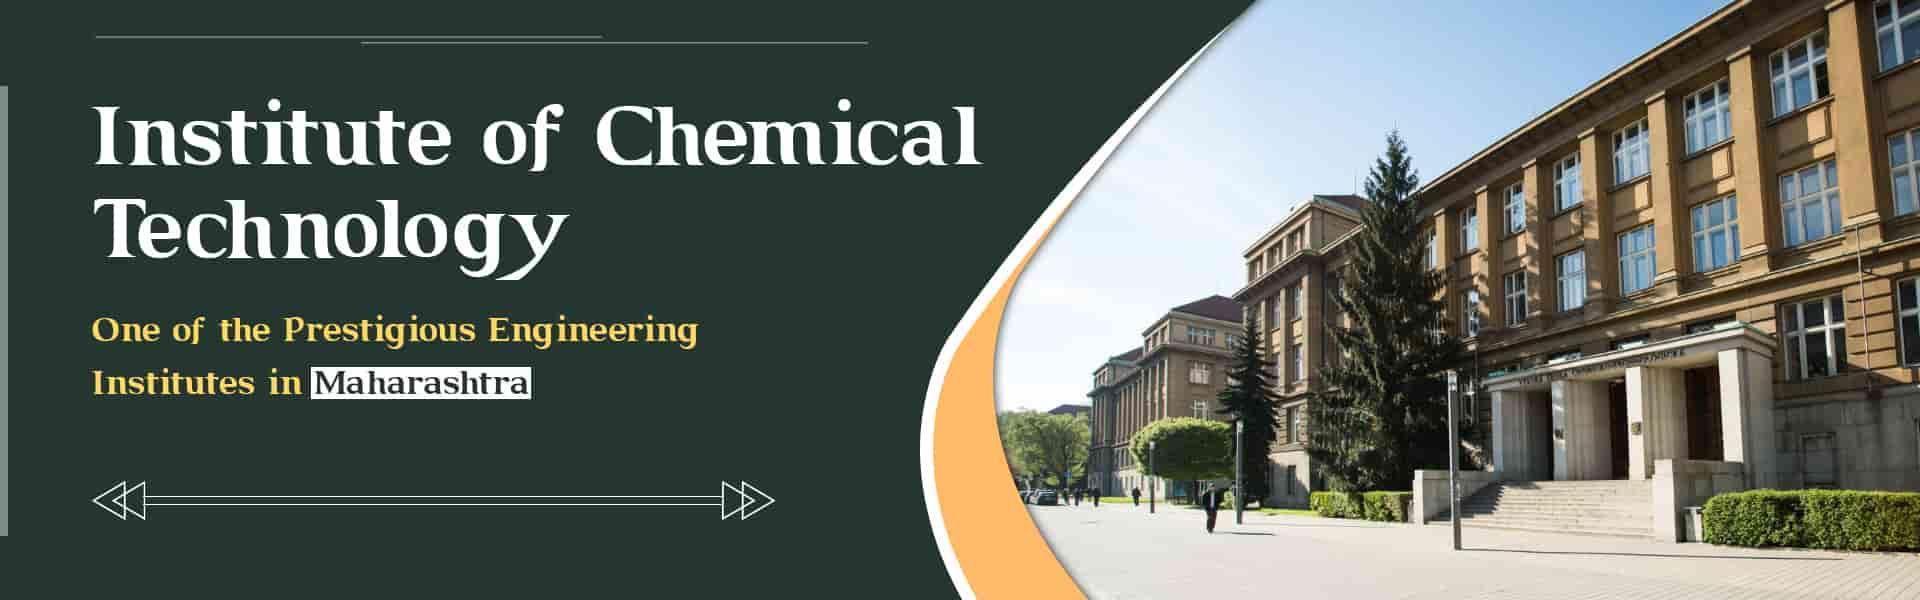 Institute of Chemical Technology (ICT Mumbai)